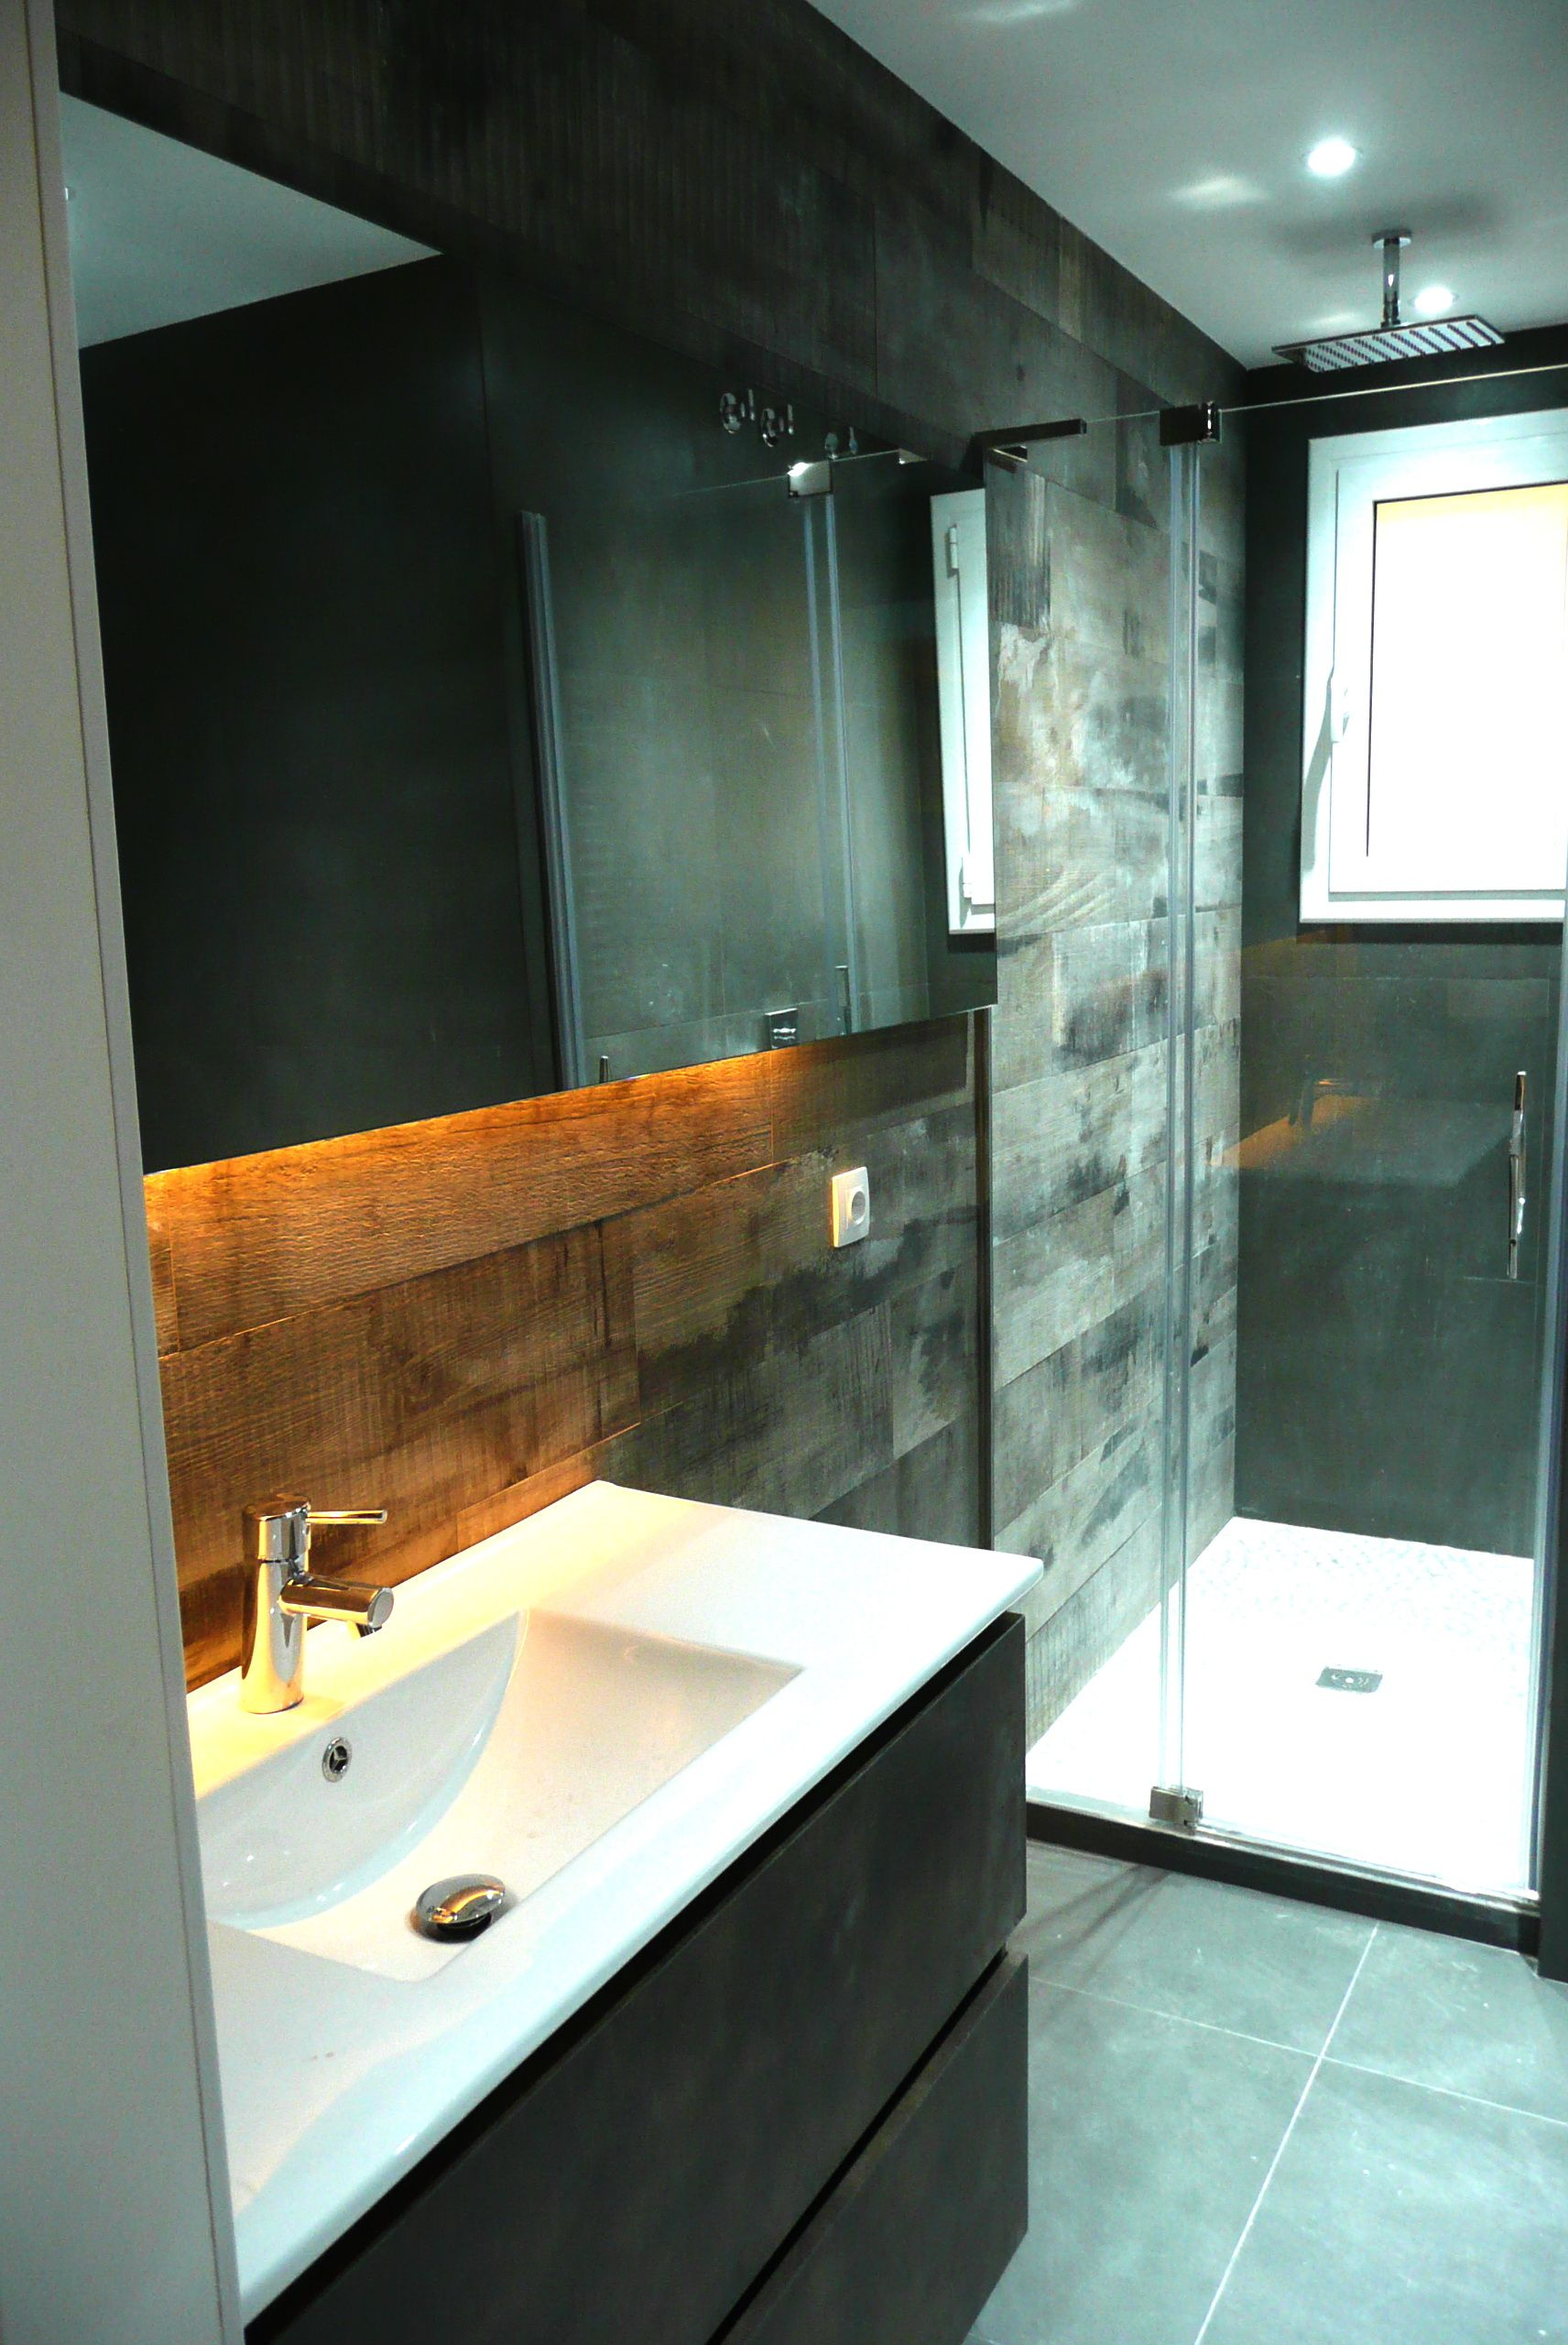 Ba o con espejo retroiluminado pared principal alicatada con gres porcelanico imitaci n madera - Espejo retroiluminado bano ...